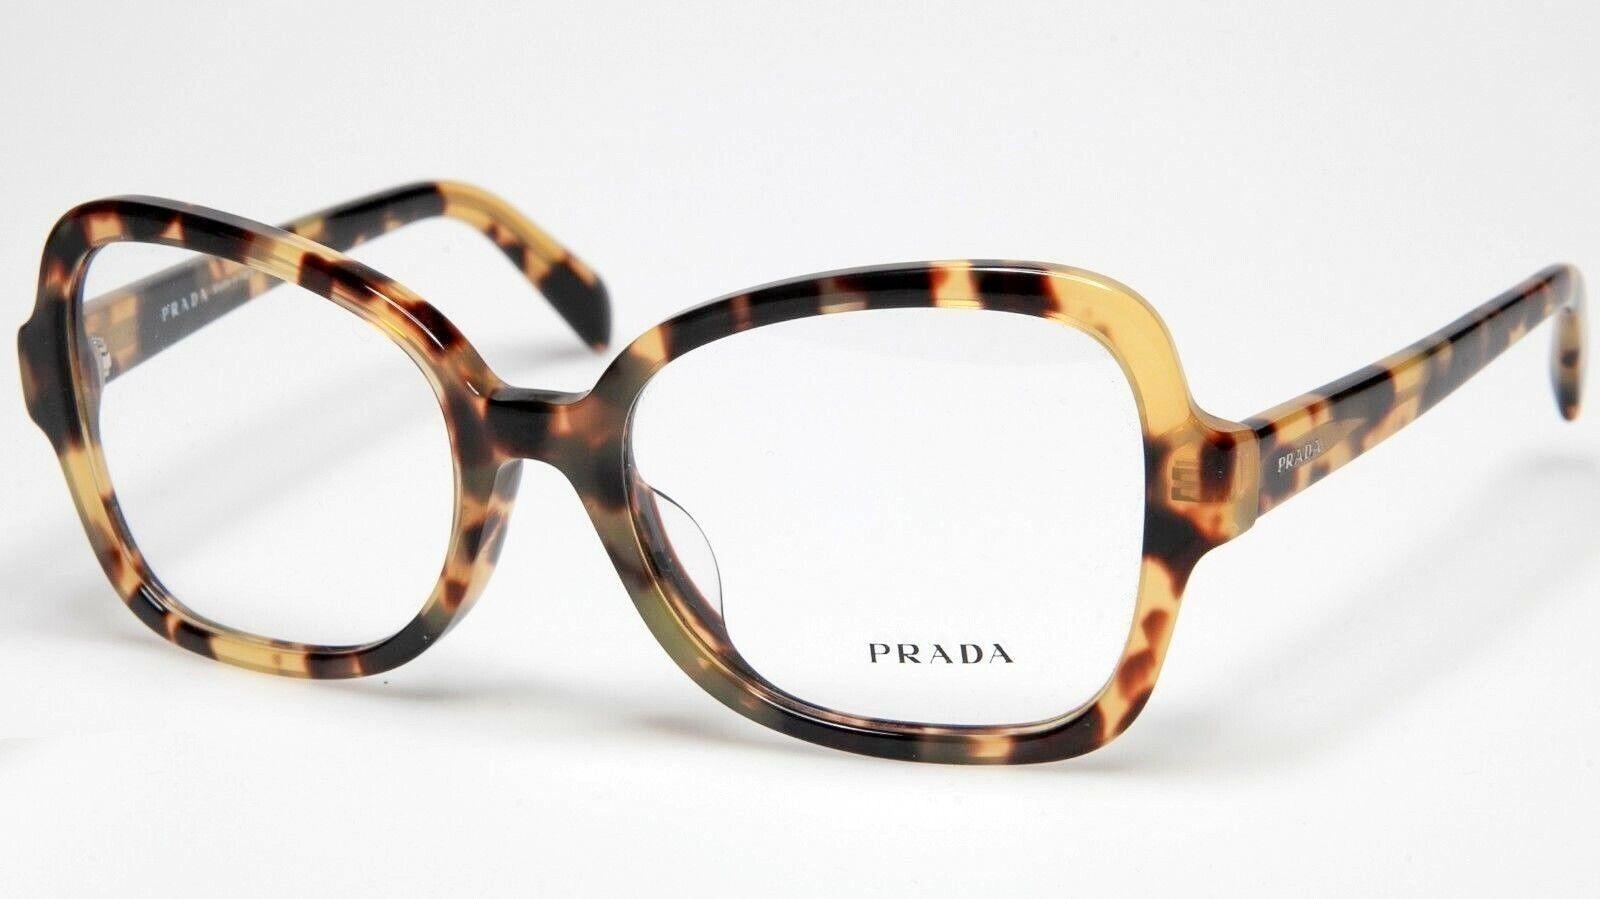 PRADA VPR 25S F 7S0-1O1 Eyeglasses Glasses Yellow Brown Hava